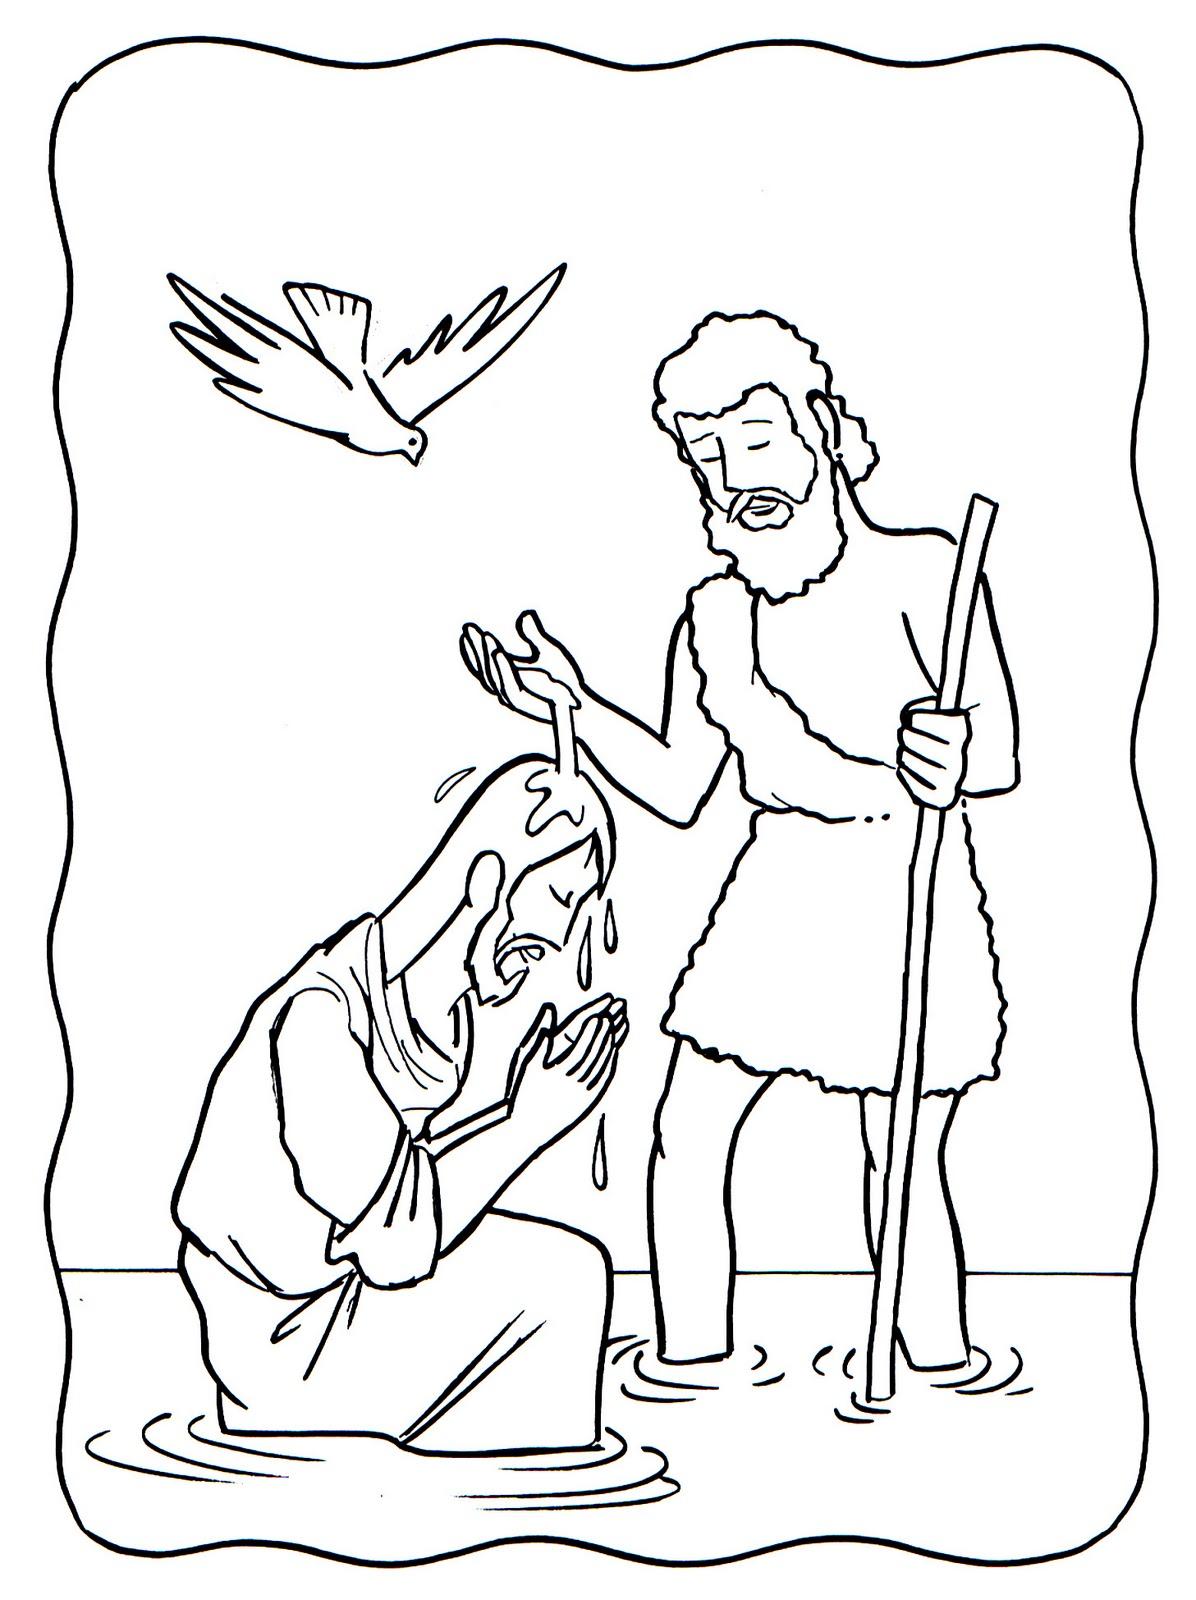 CLASE ROQUITAS: JESÚS AGRADA AL PADRE CELESTIAL